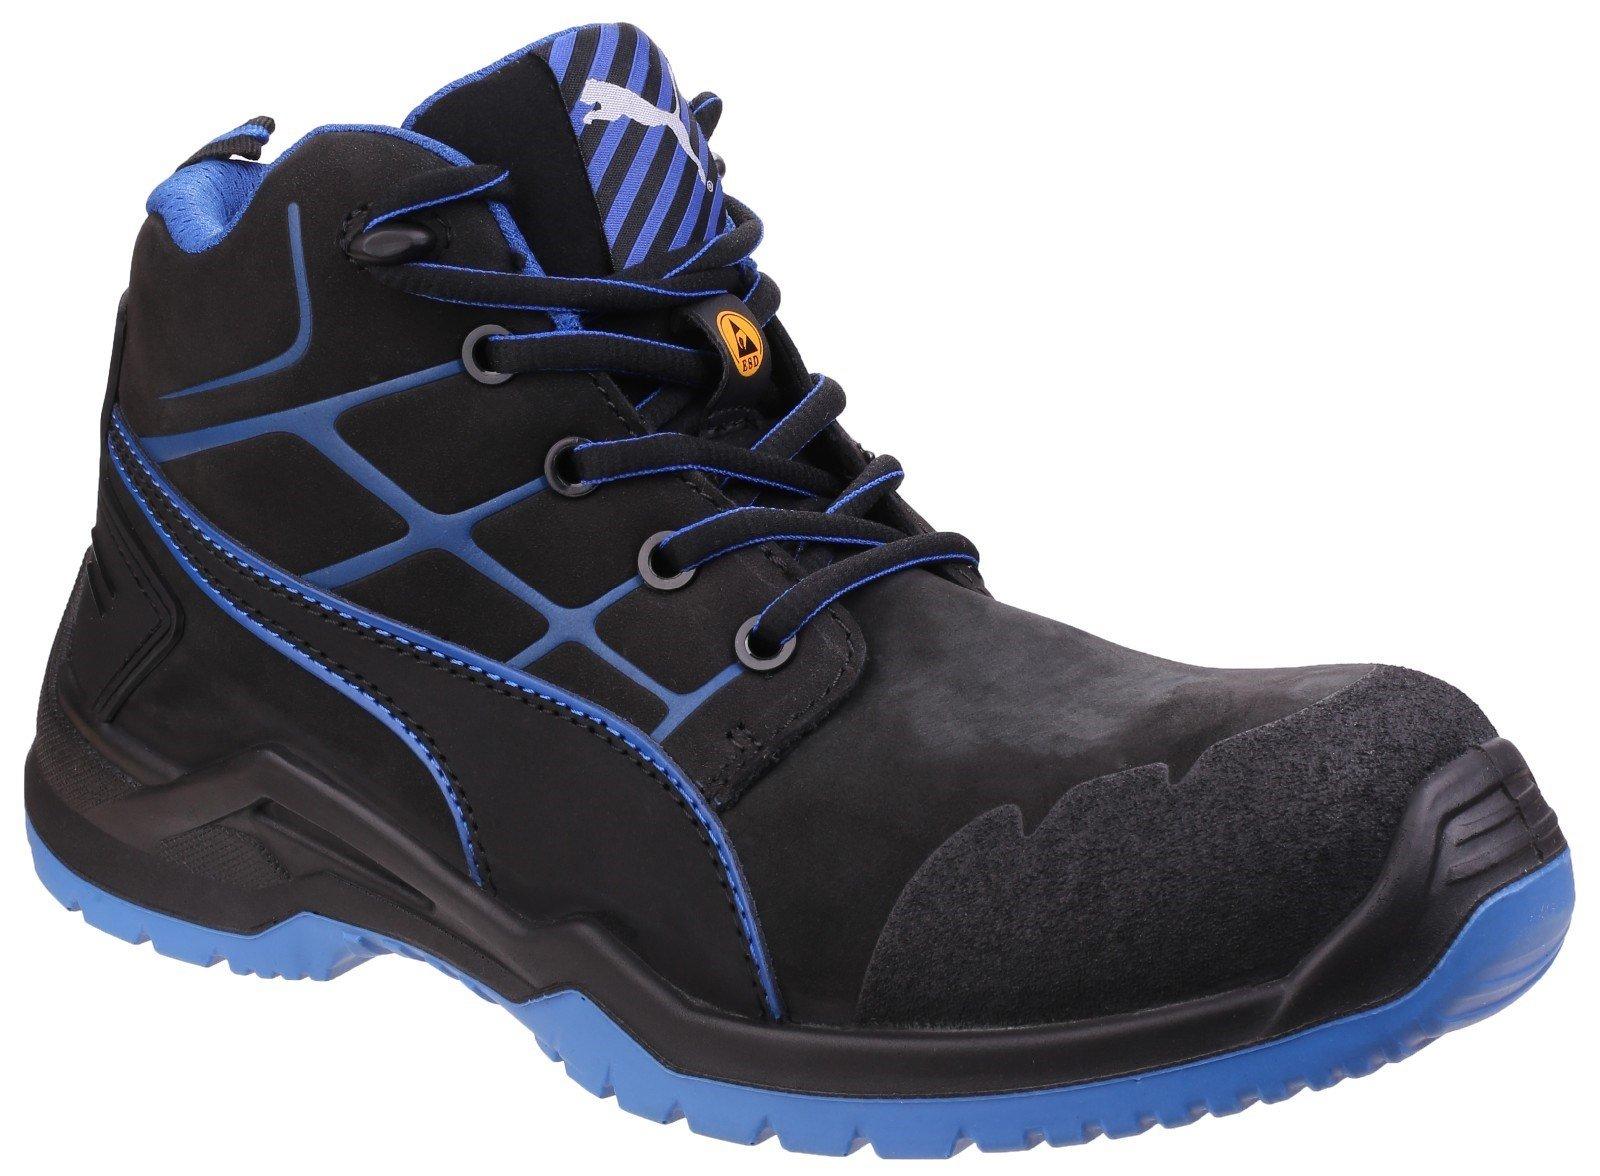 Puma Safety Unisex Krypton Lace-up Boot Blue 25461 - Blue 13